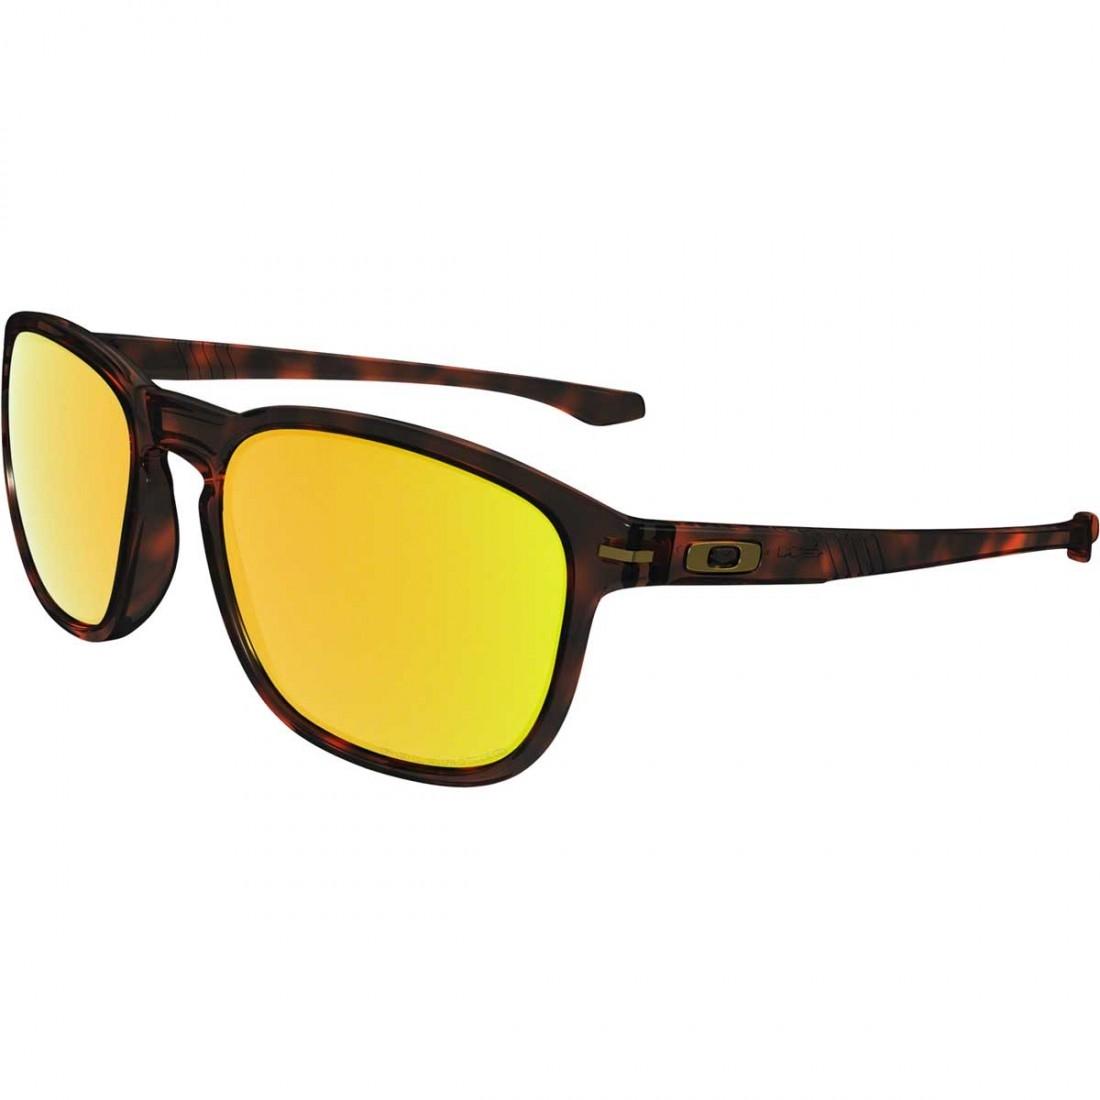 b335b3d821 OAKLEY Enduro Shaun White Collection Tortoise   24K Iridium Polarized Sun  glasses · Motocard